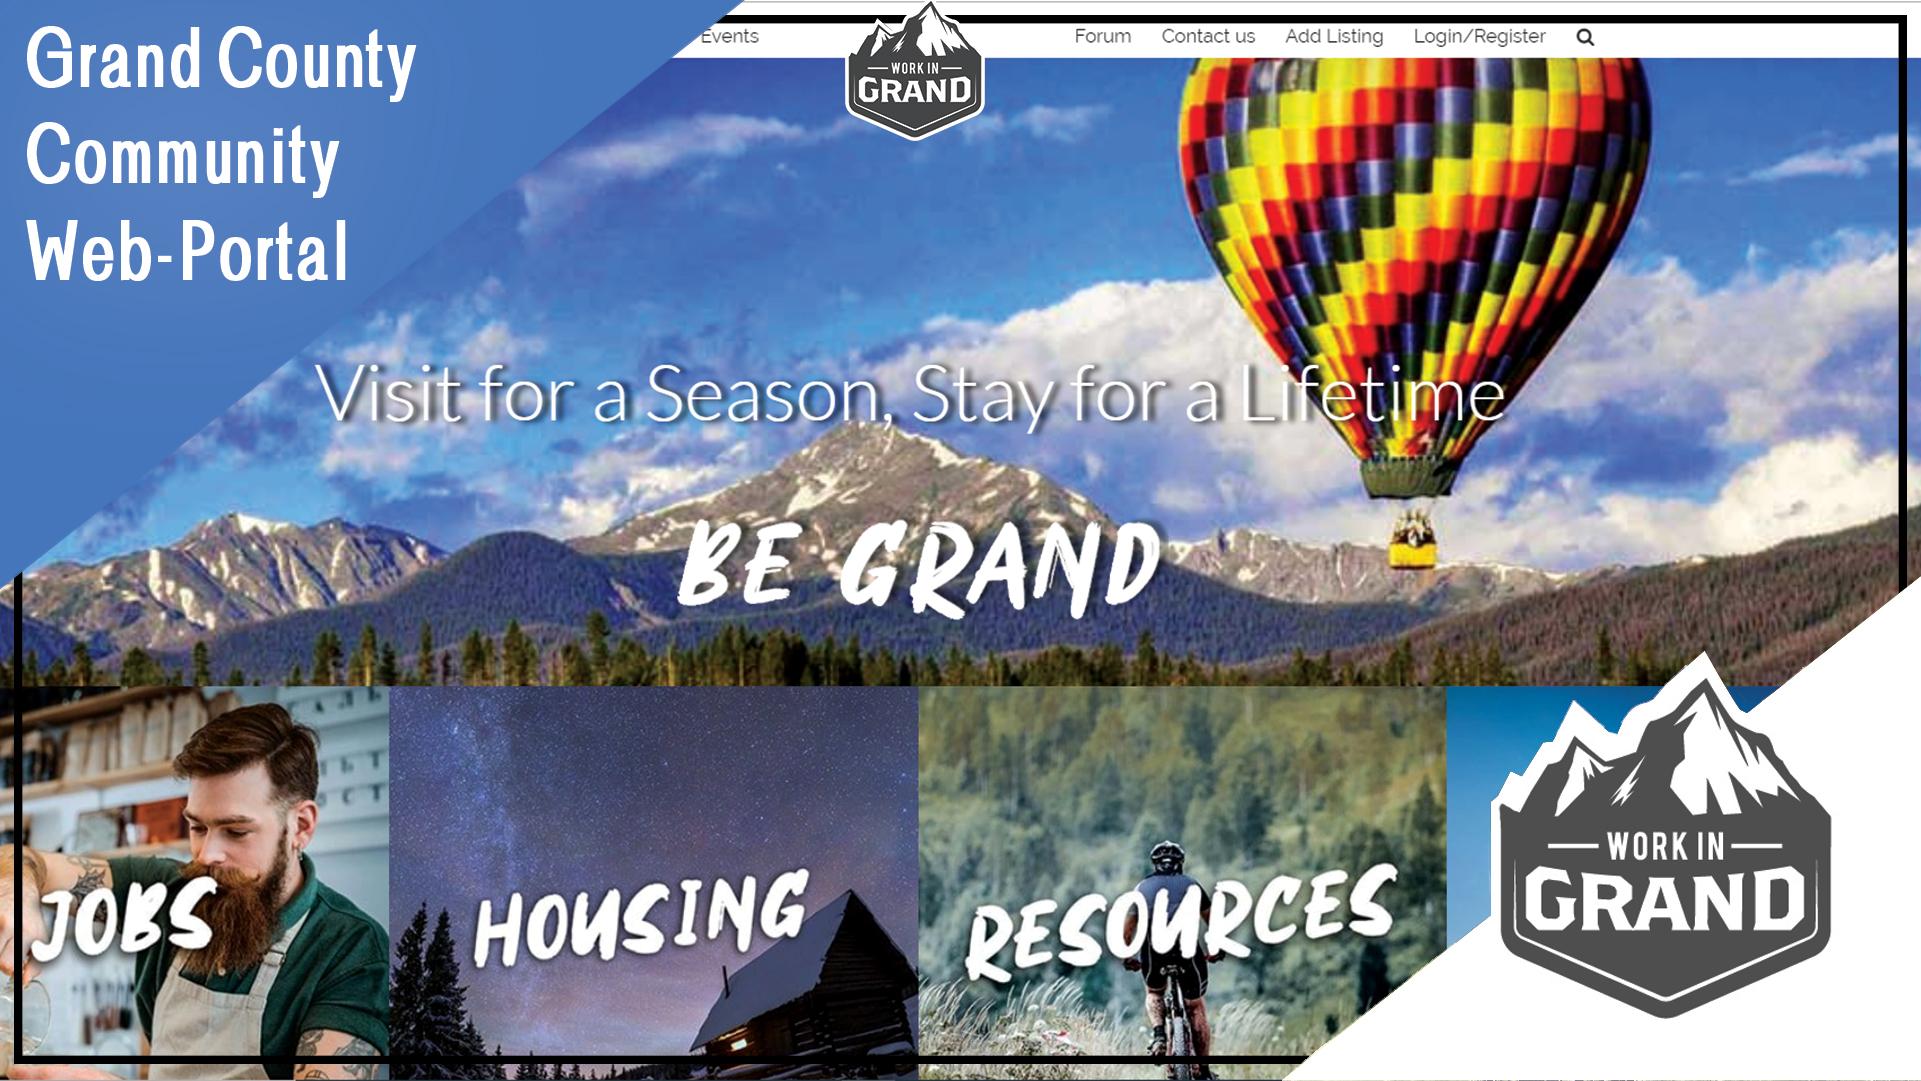 Grand County Community Web-Portal